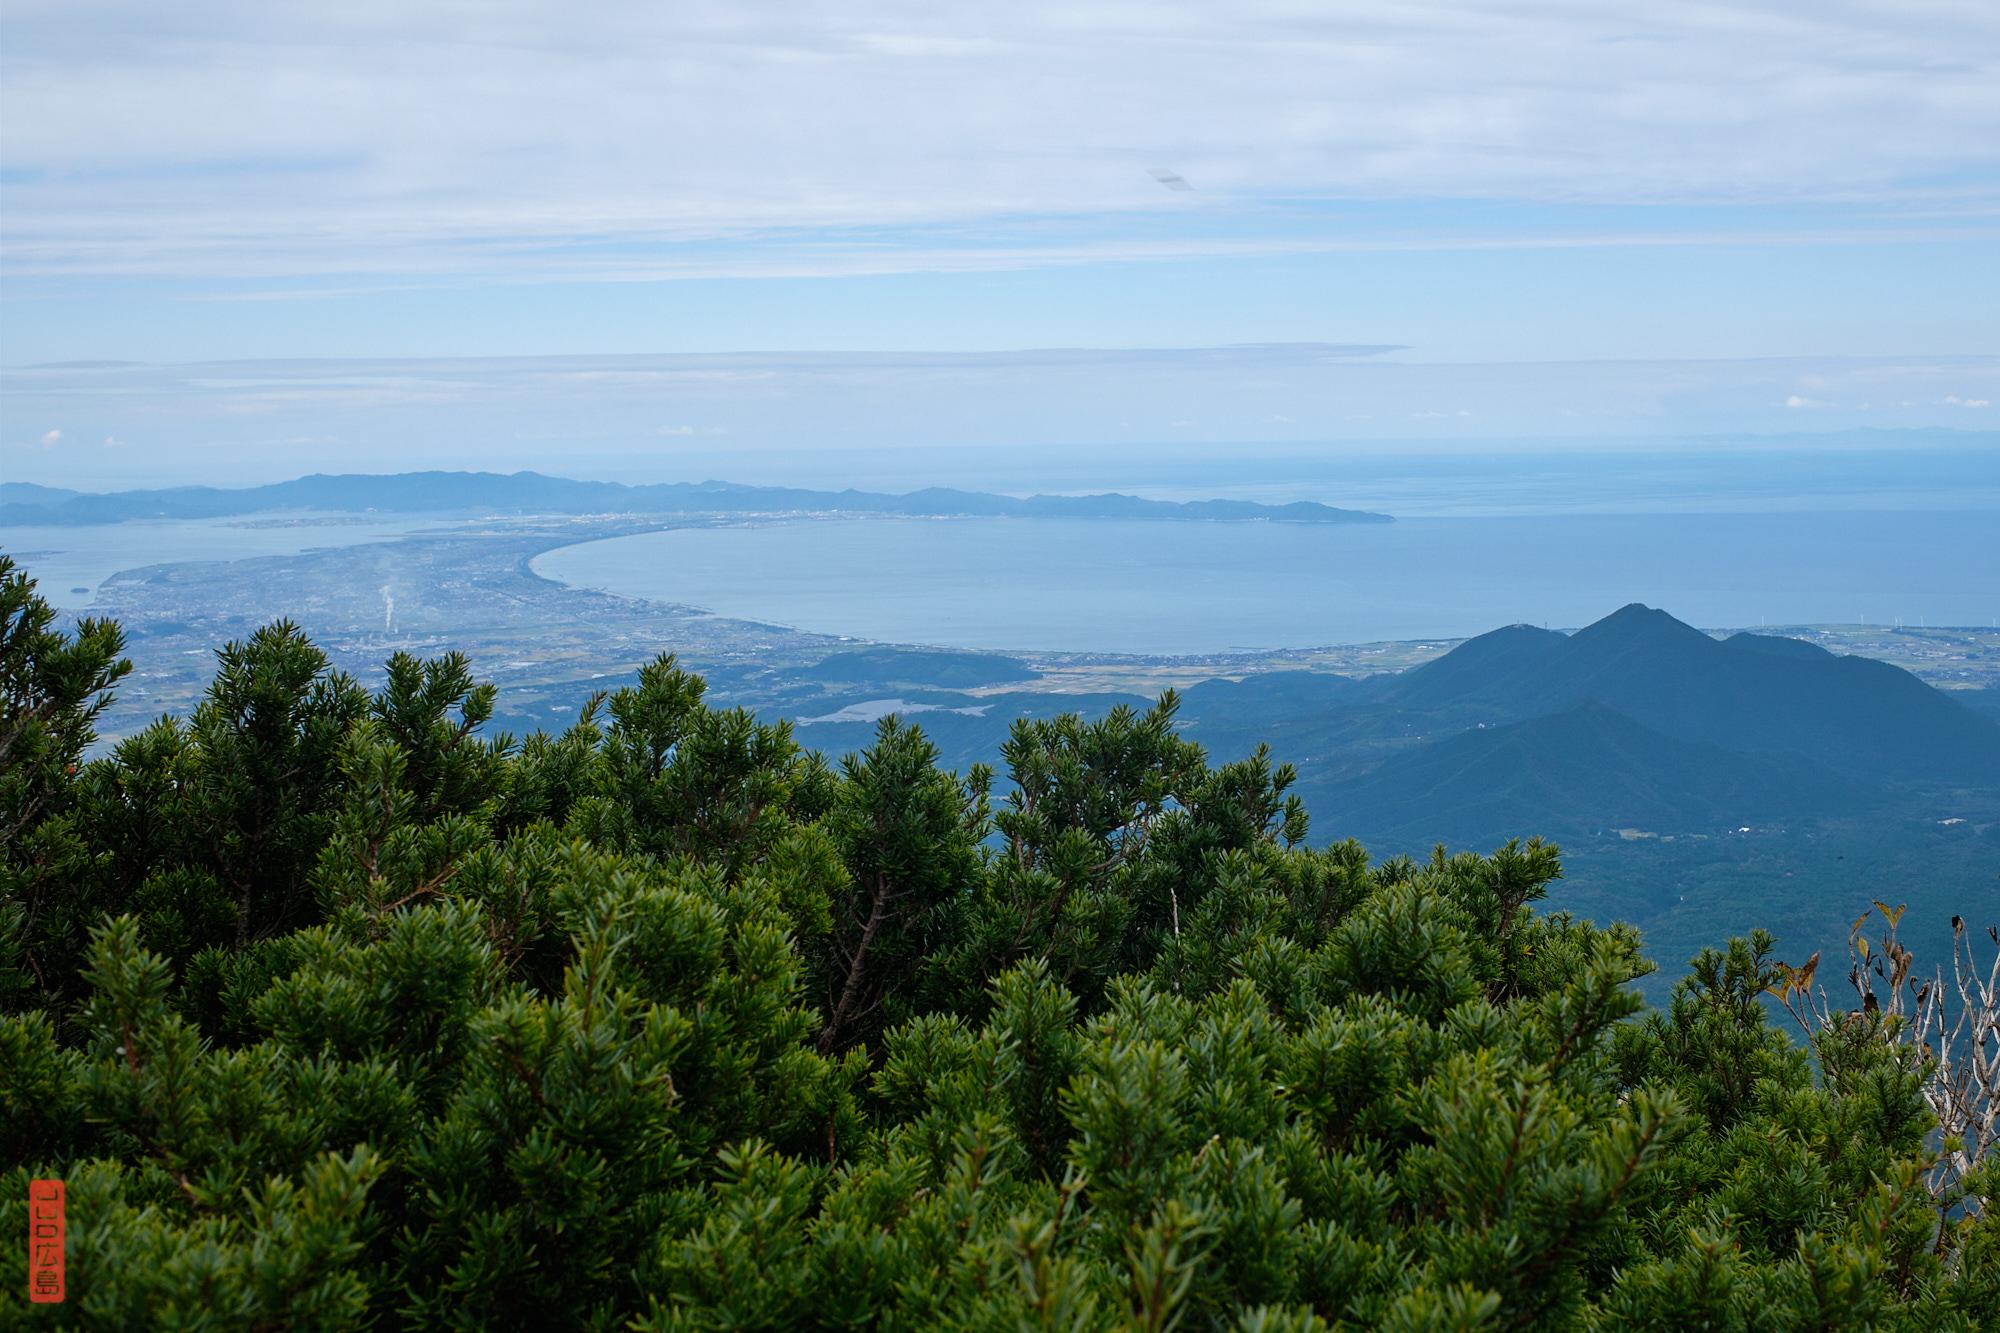 buissons de kyaraboku et vue sur la péninsule Yumigahama